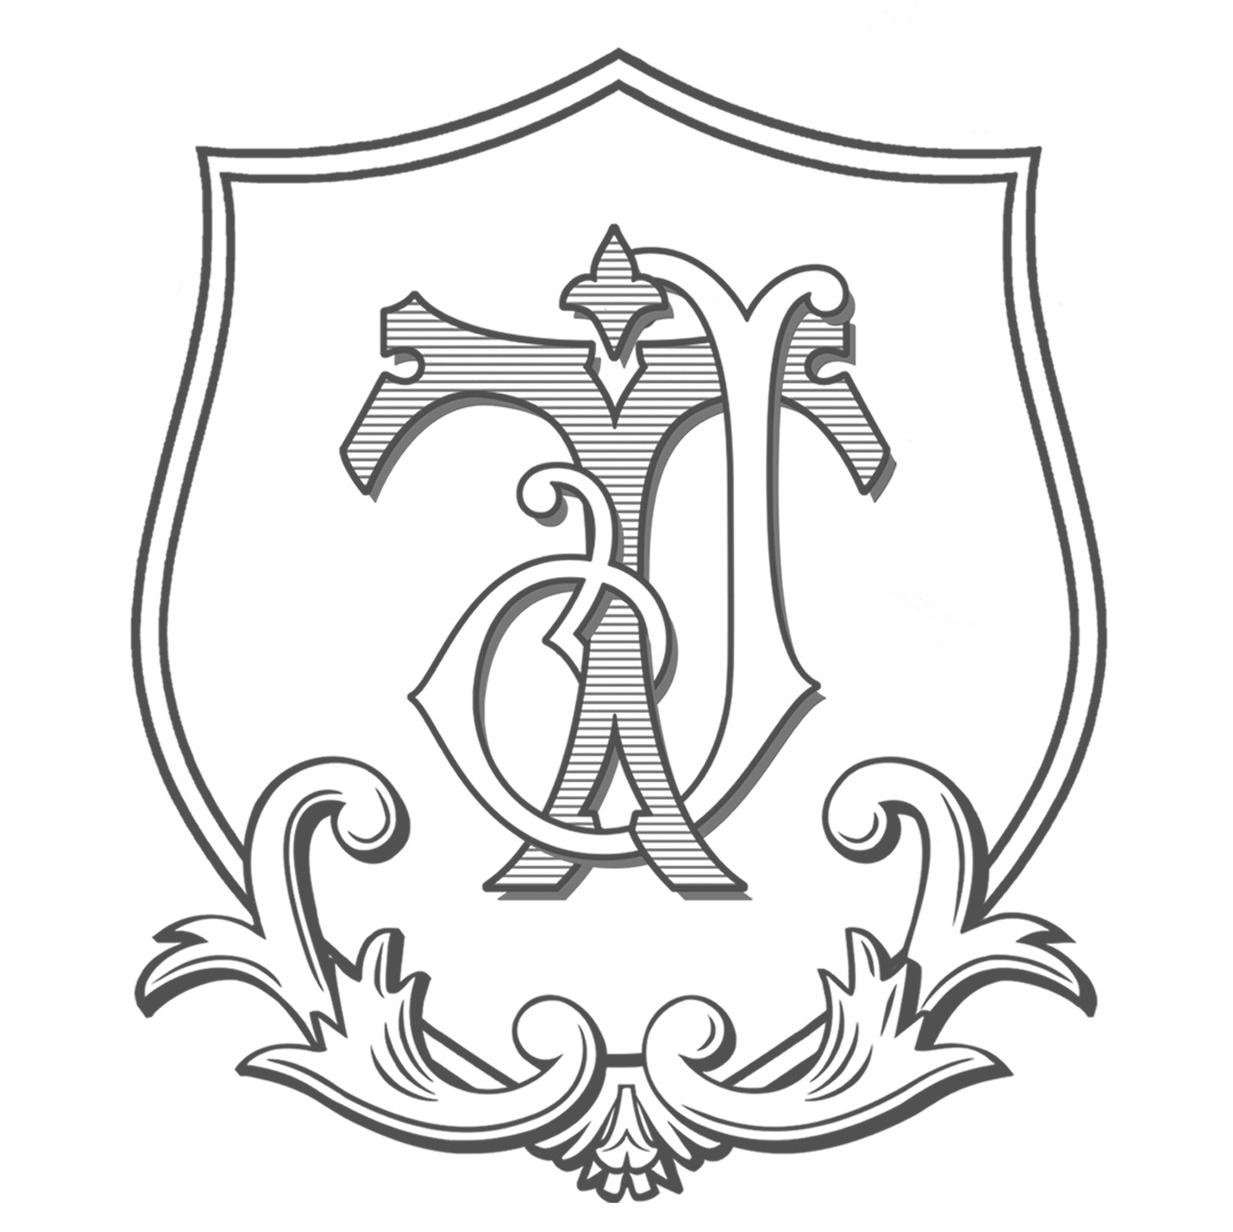 Taylor - Crest (small).jpg